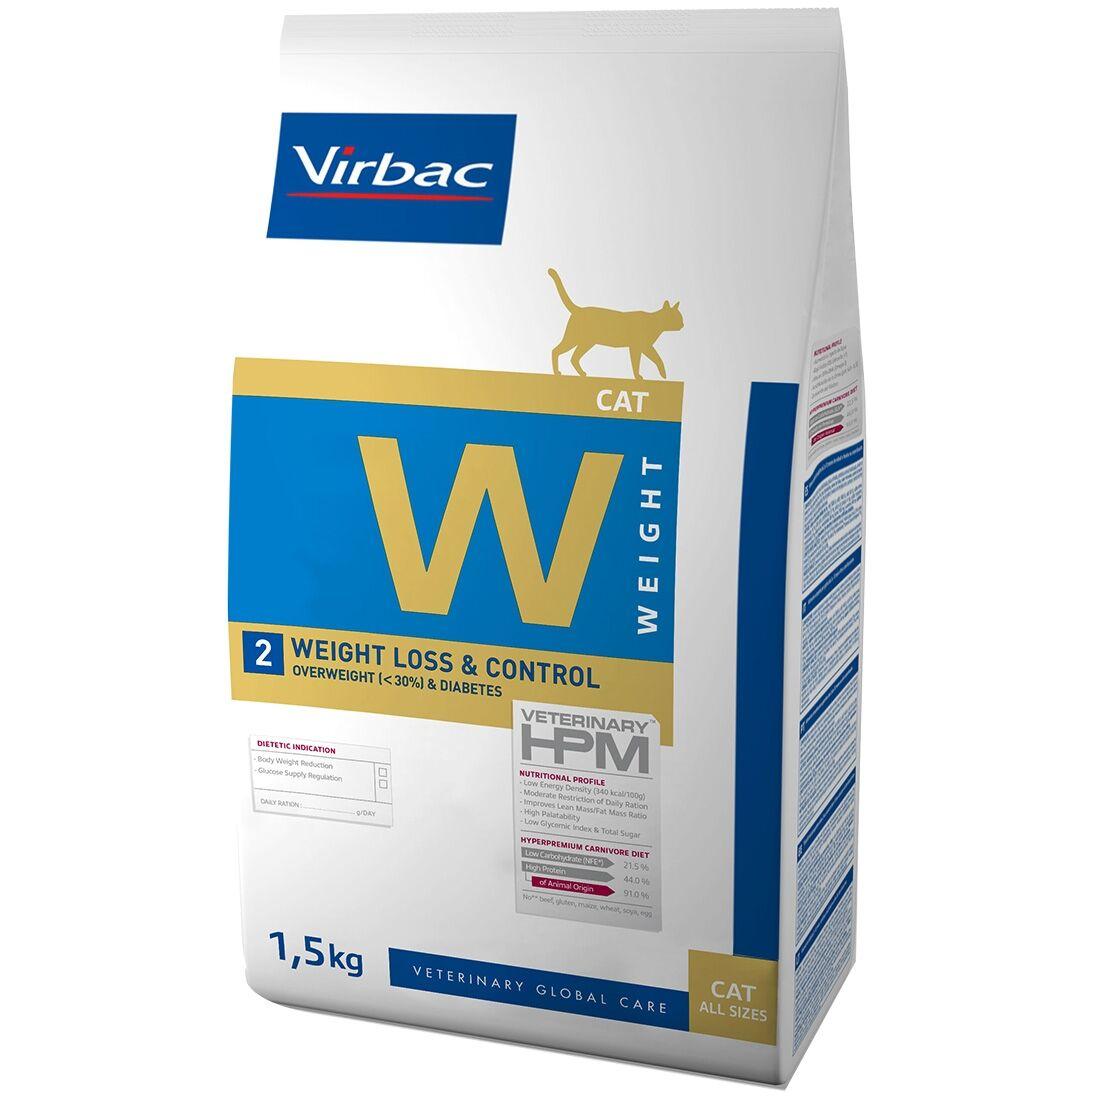 Virbac Veterinary HPM Weight Loss & Control Cat Contenance : 7 kg